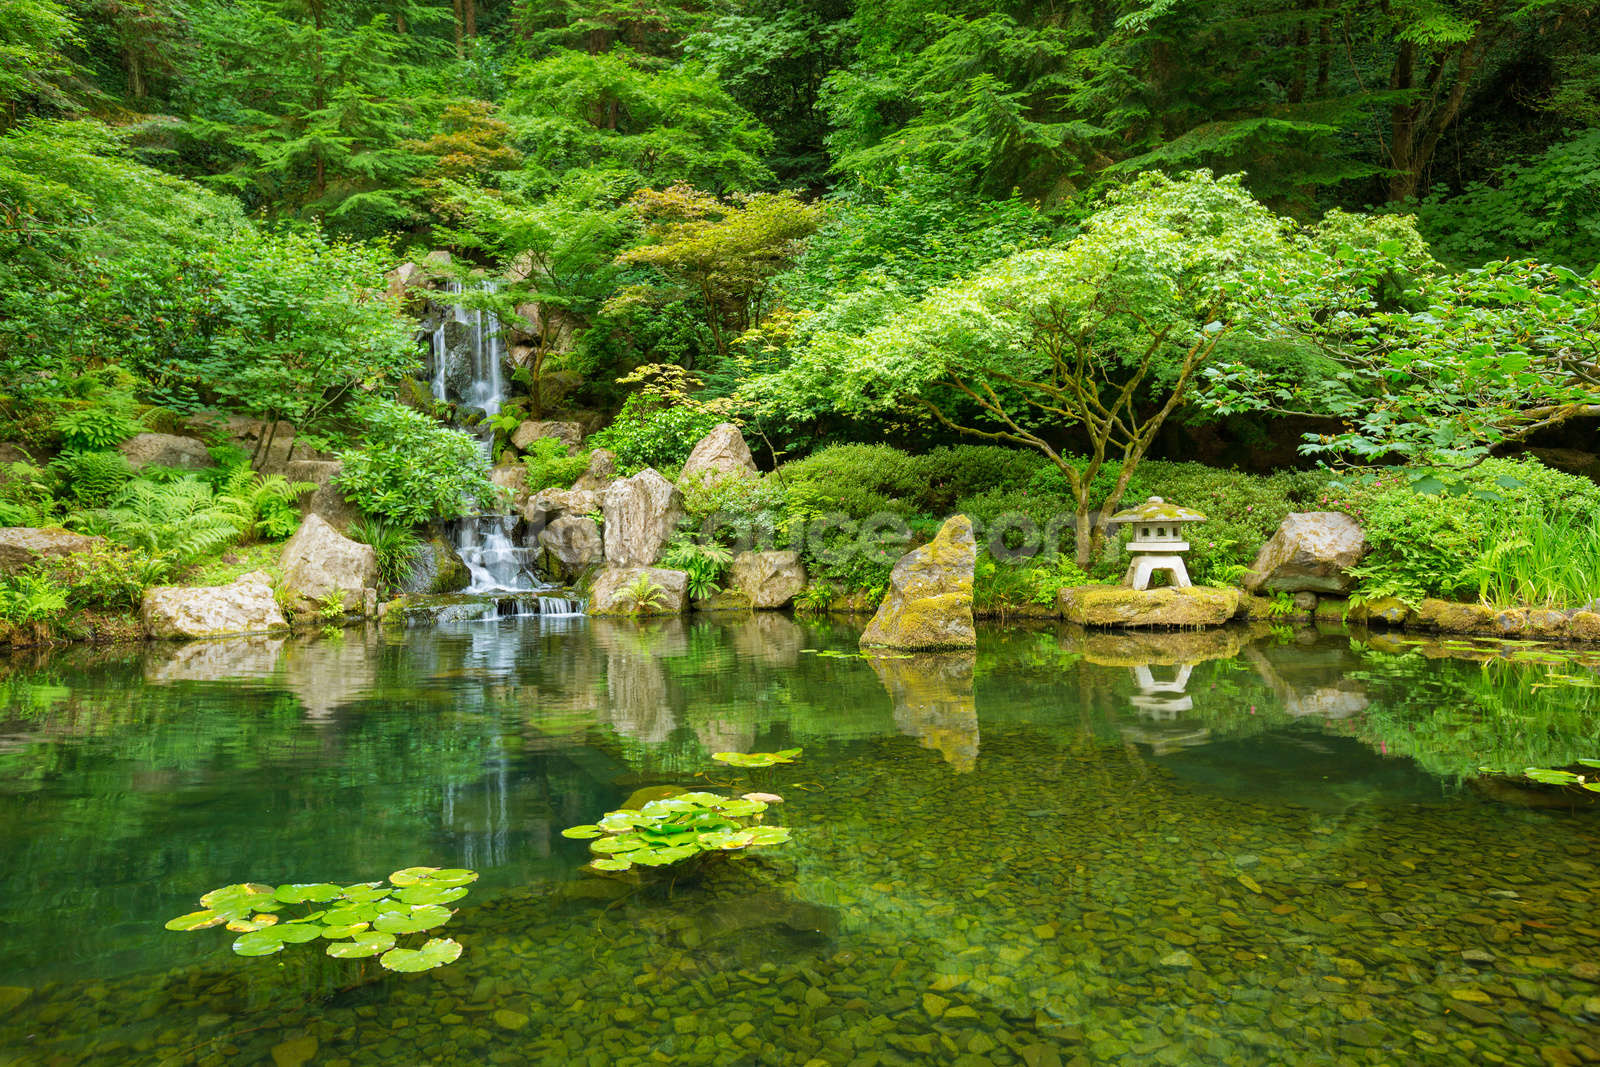 Charming Beautiful Japanese Garden Wall Mural Photo Wallpaper Part 6